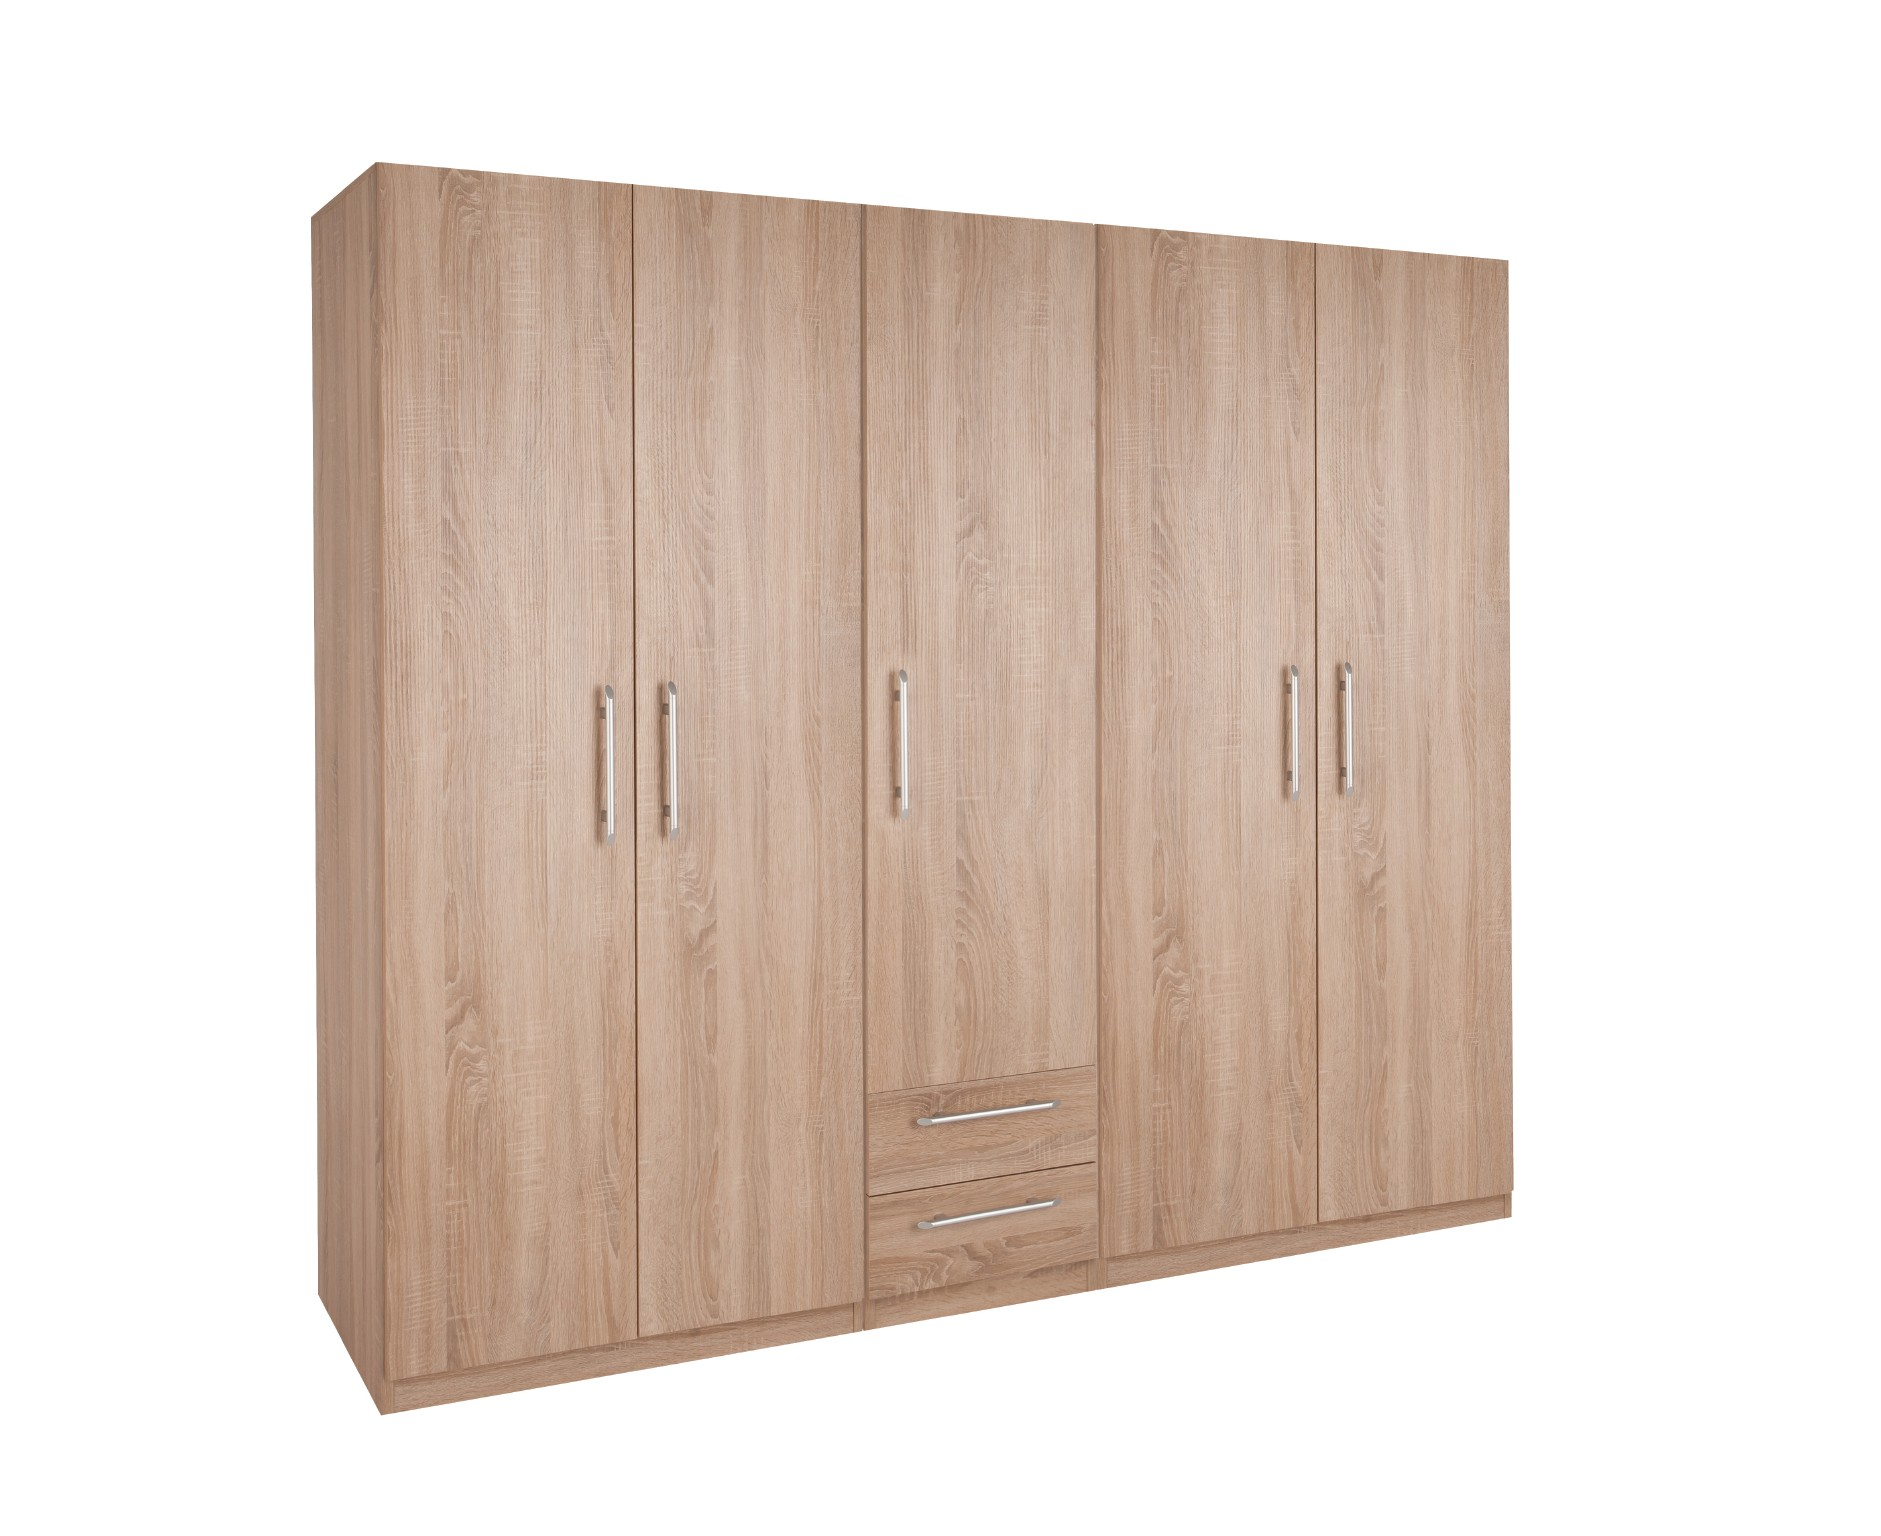 Holborn 5 Door 2 Drawer Wardrobe